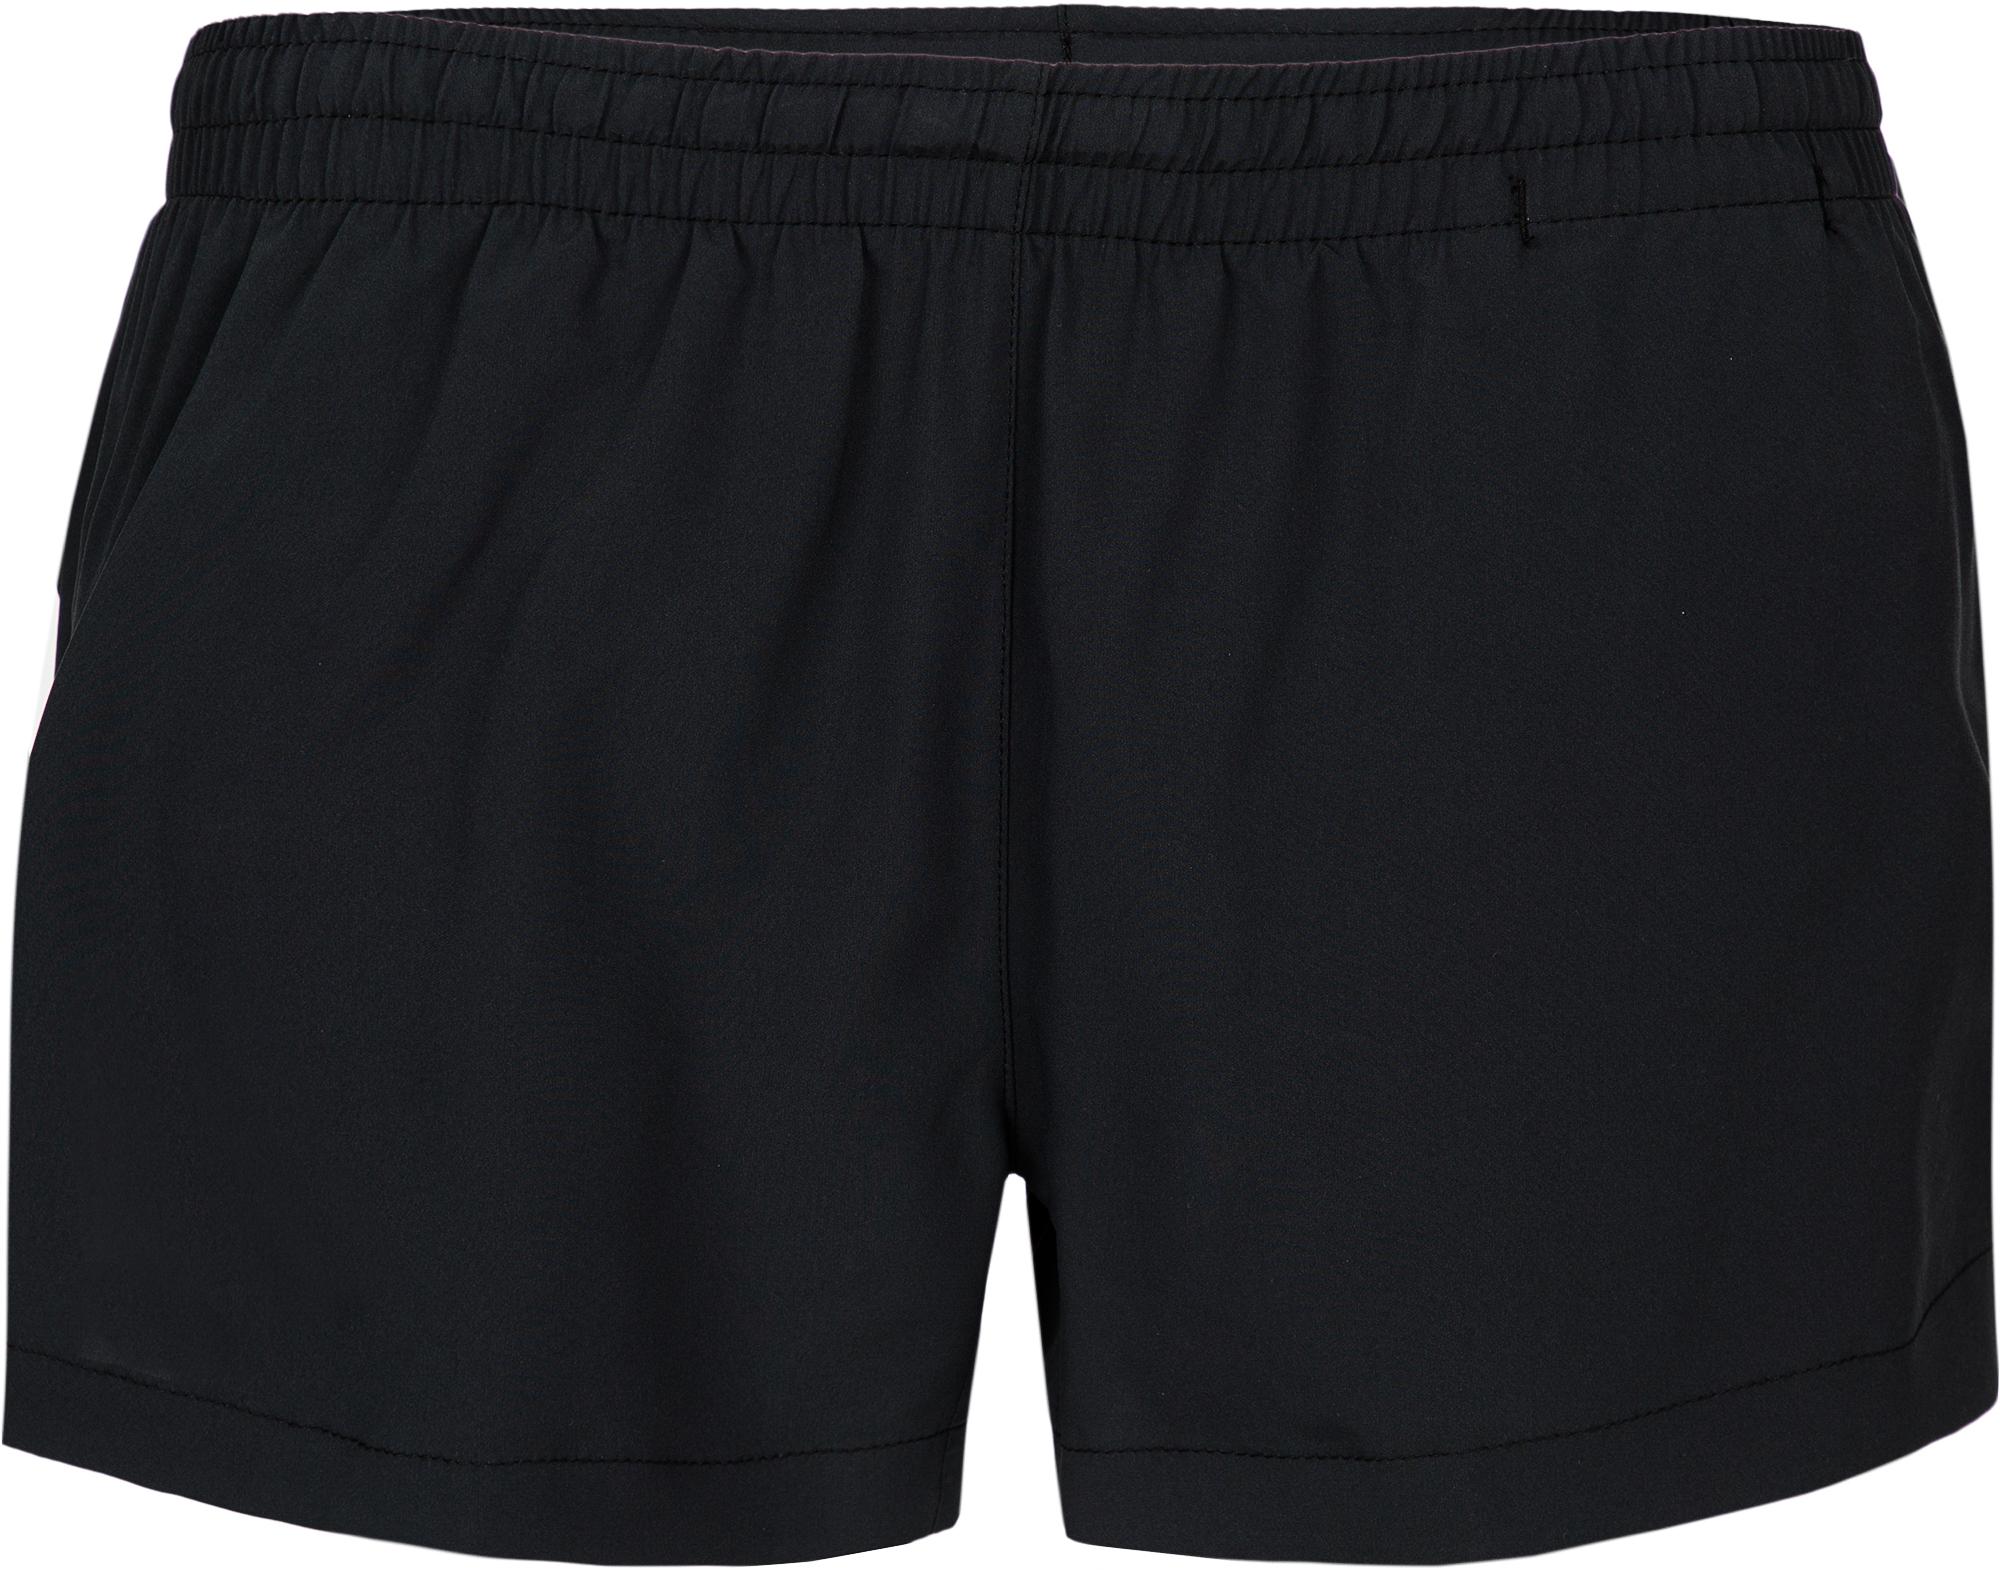 Nike Шорты женские Elevate Trck, размер 46-48